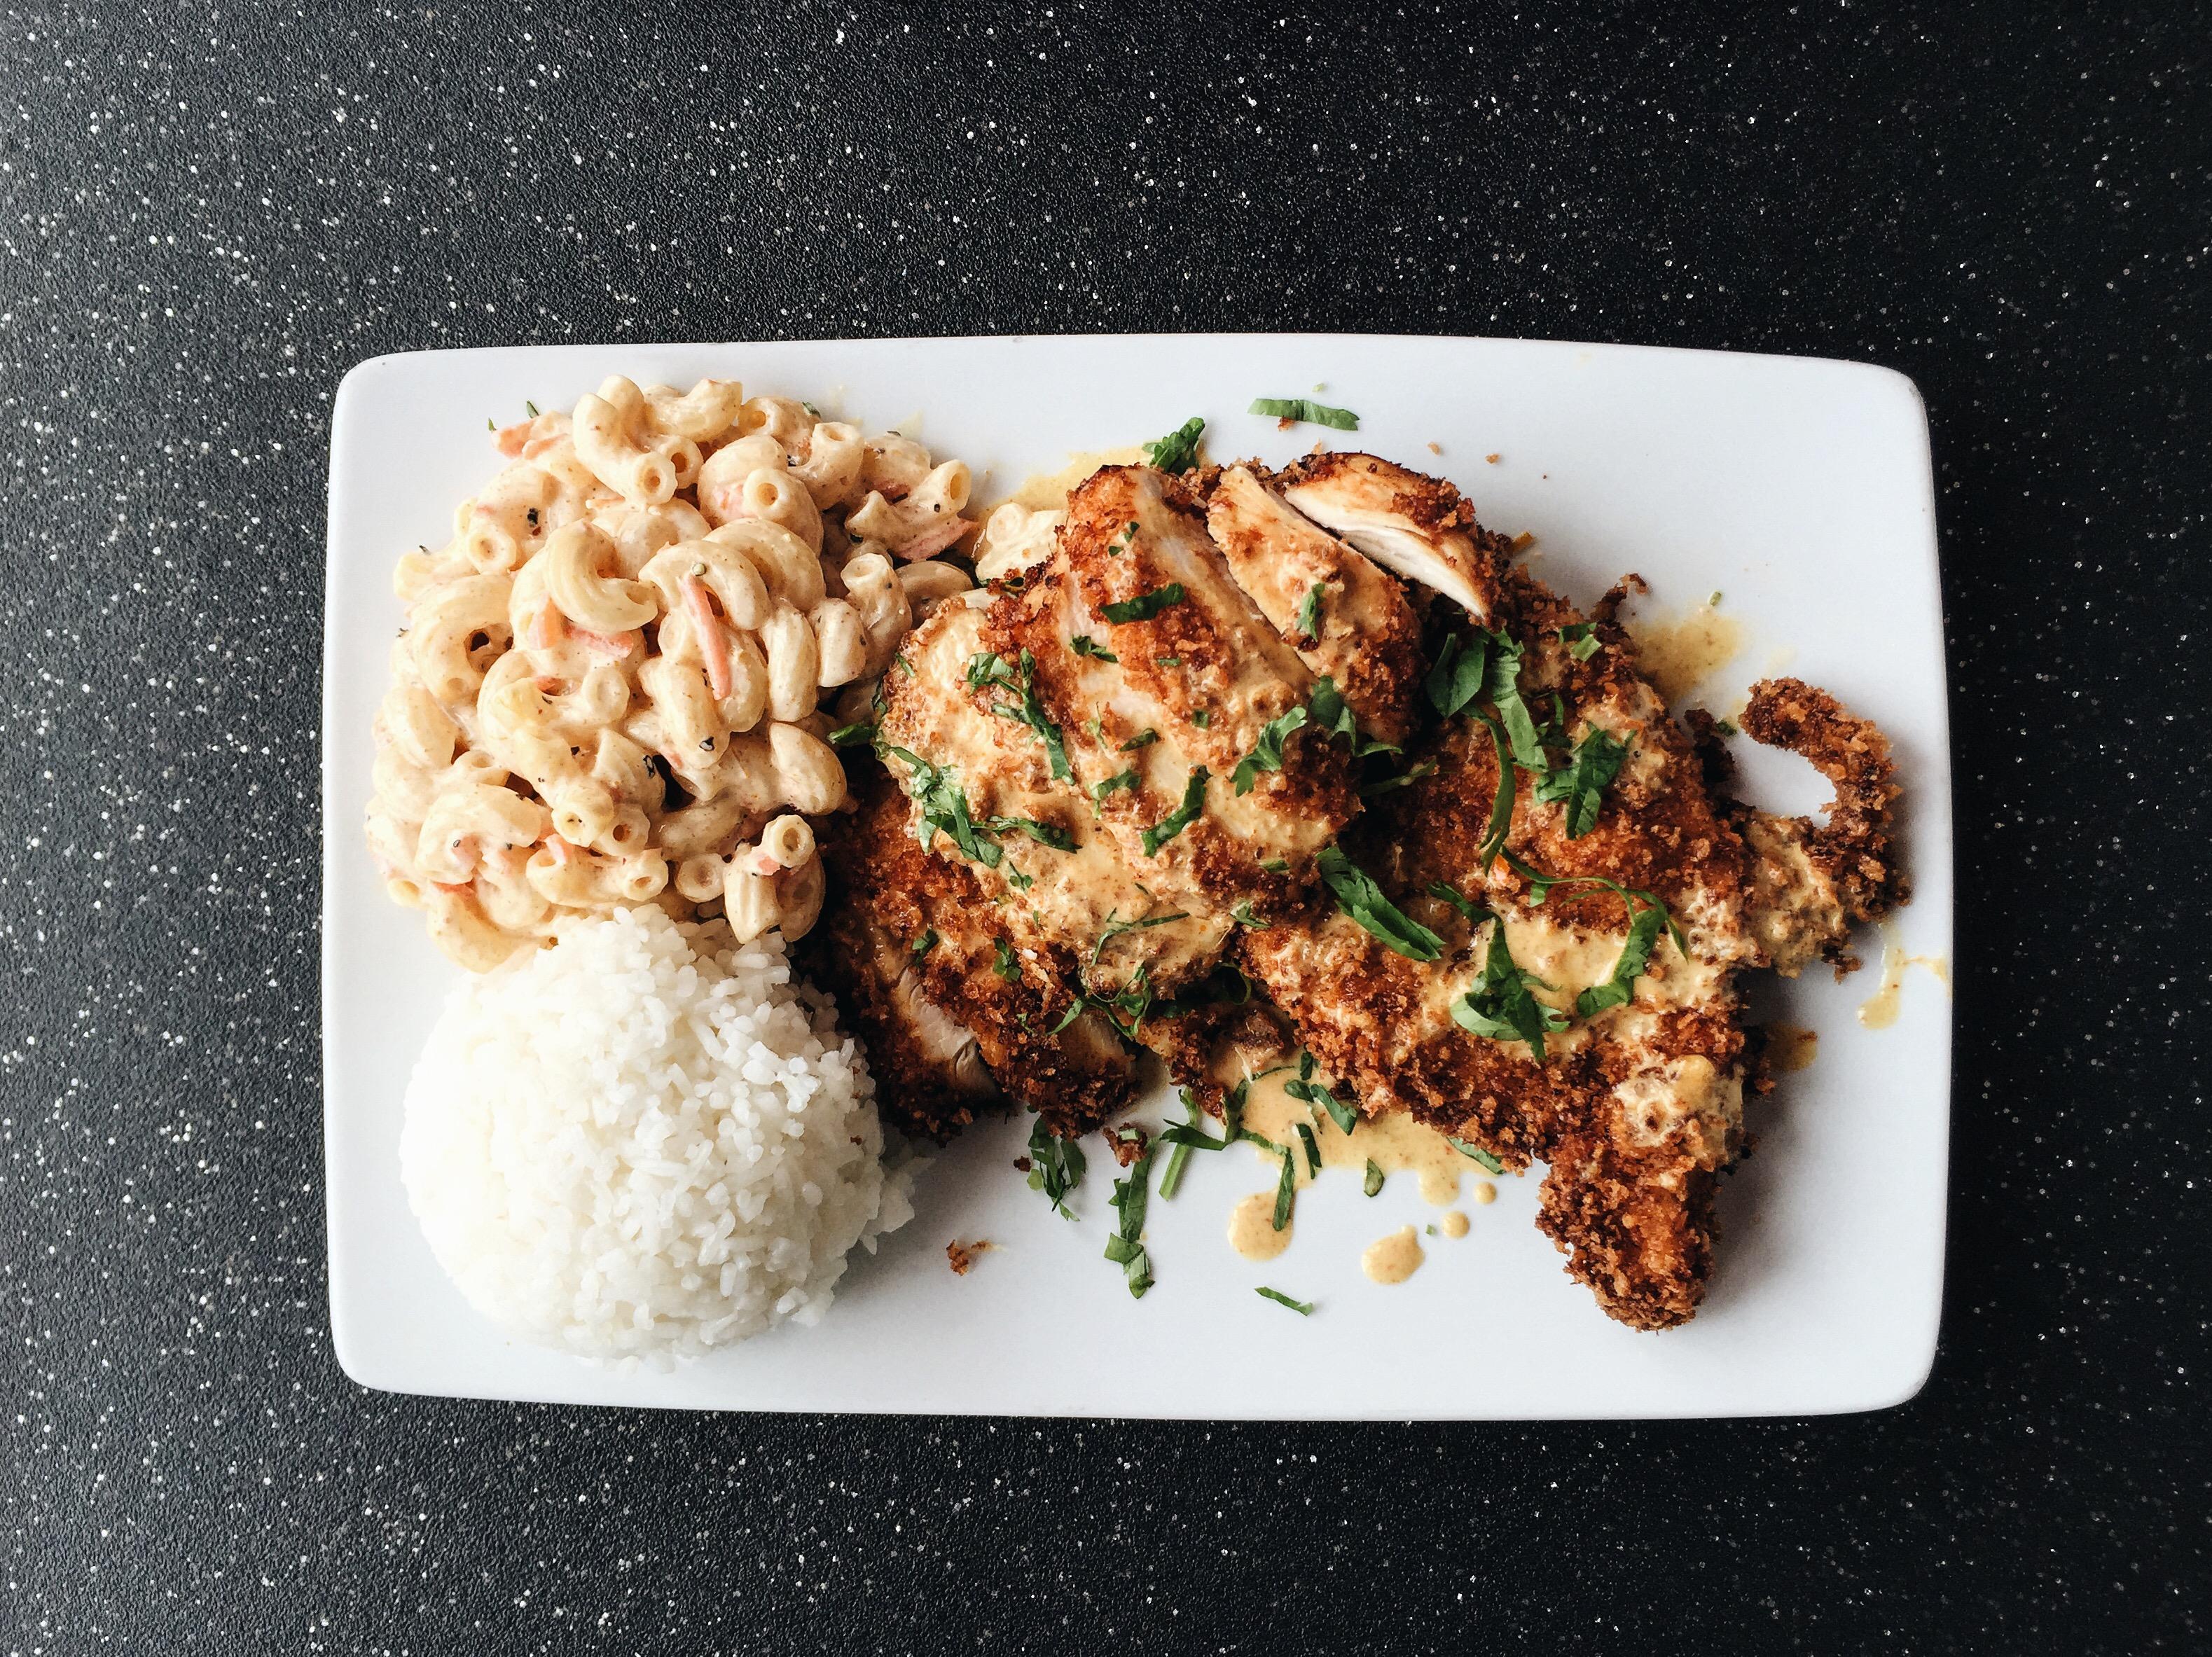 Chef Erwin Tjahyadi's Island Style Chicken Katsu